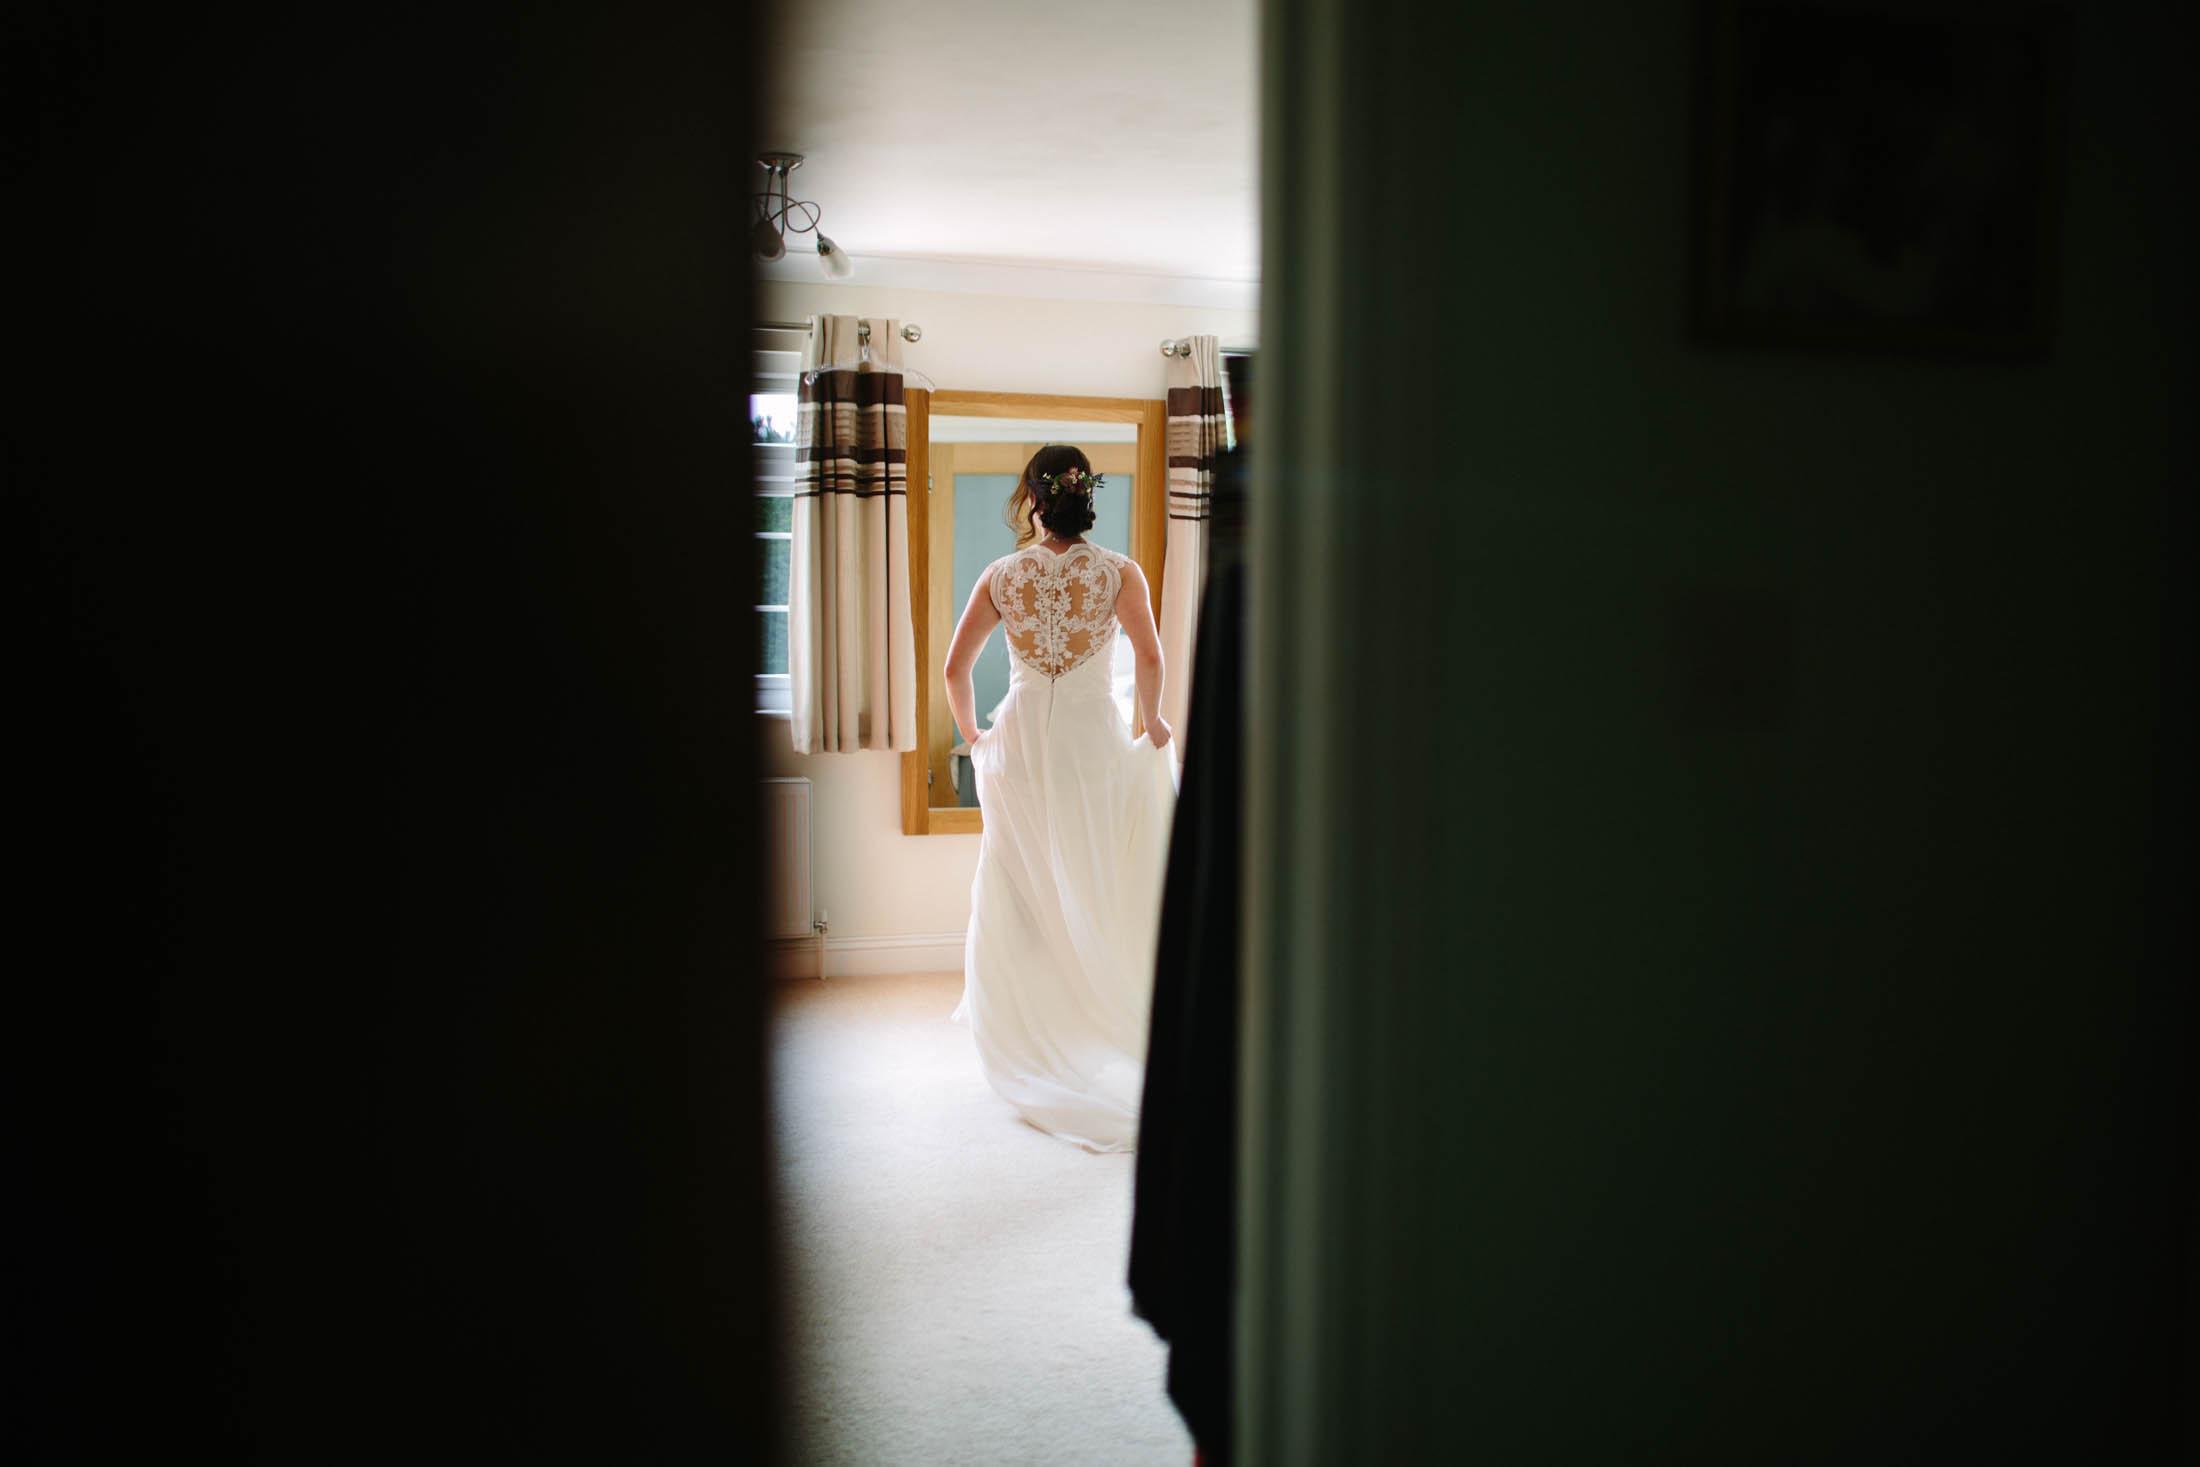 JessicaJillPhotography-HarewoodsHomeFarmWedding-SouthEastWeddingPhotographer-14.jpg